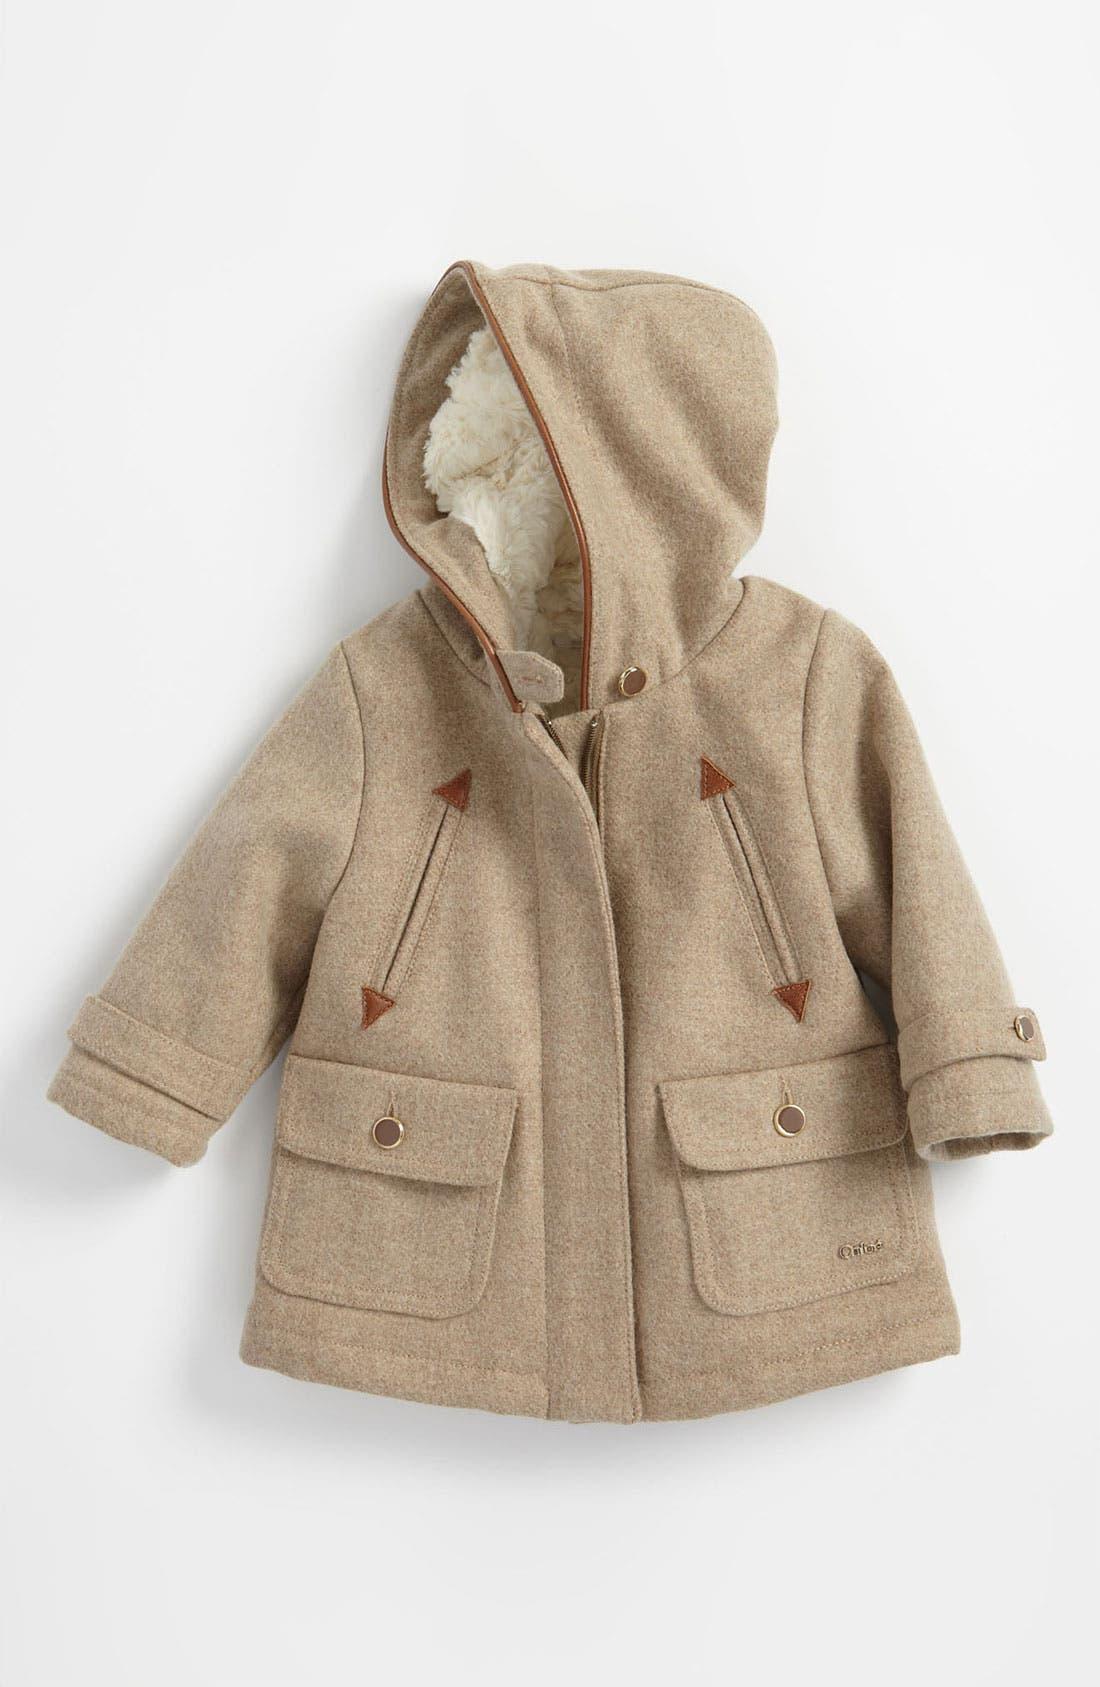 Alternate Image 1 Selected - Chloé Wool Blend Hooded Coat (Toddler)